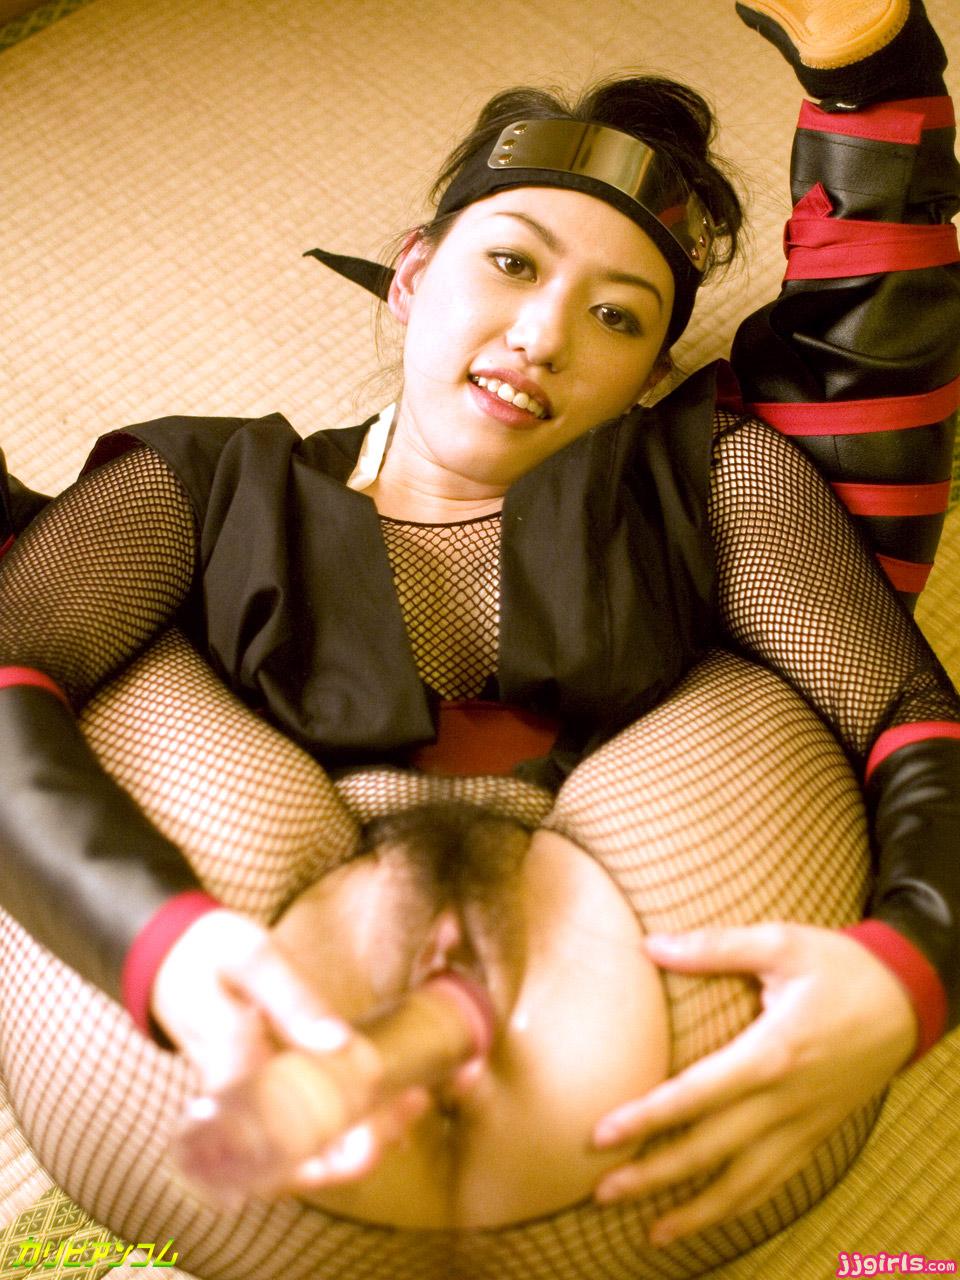 braga-mad-asian-ninja-porn-movie